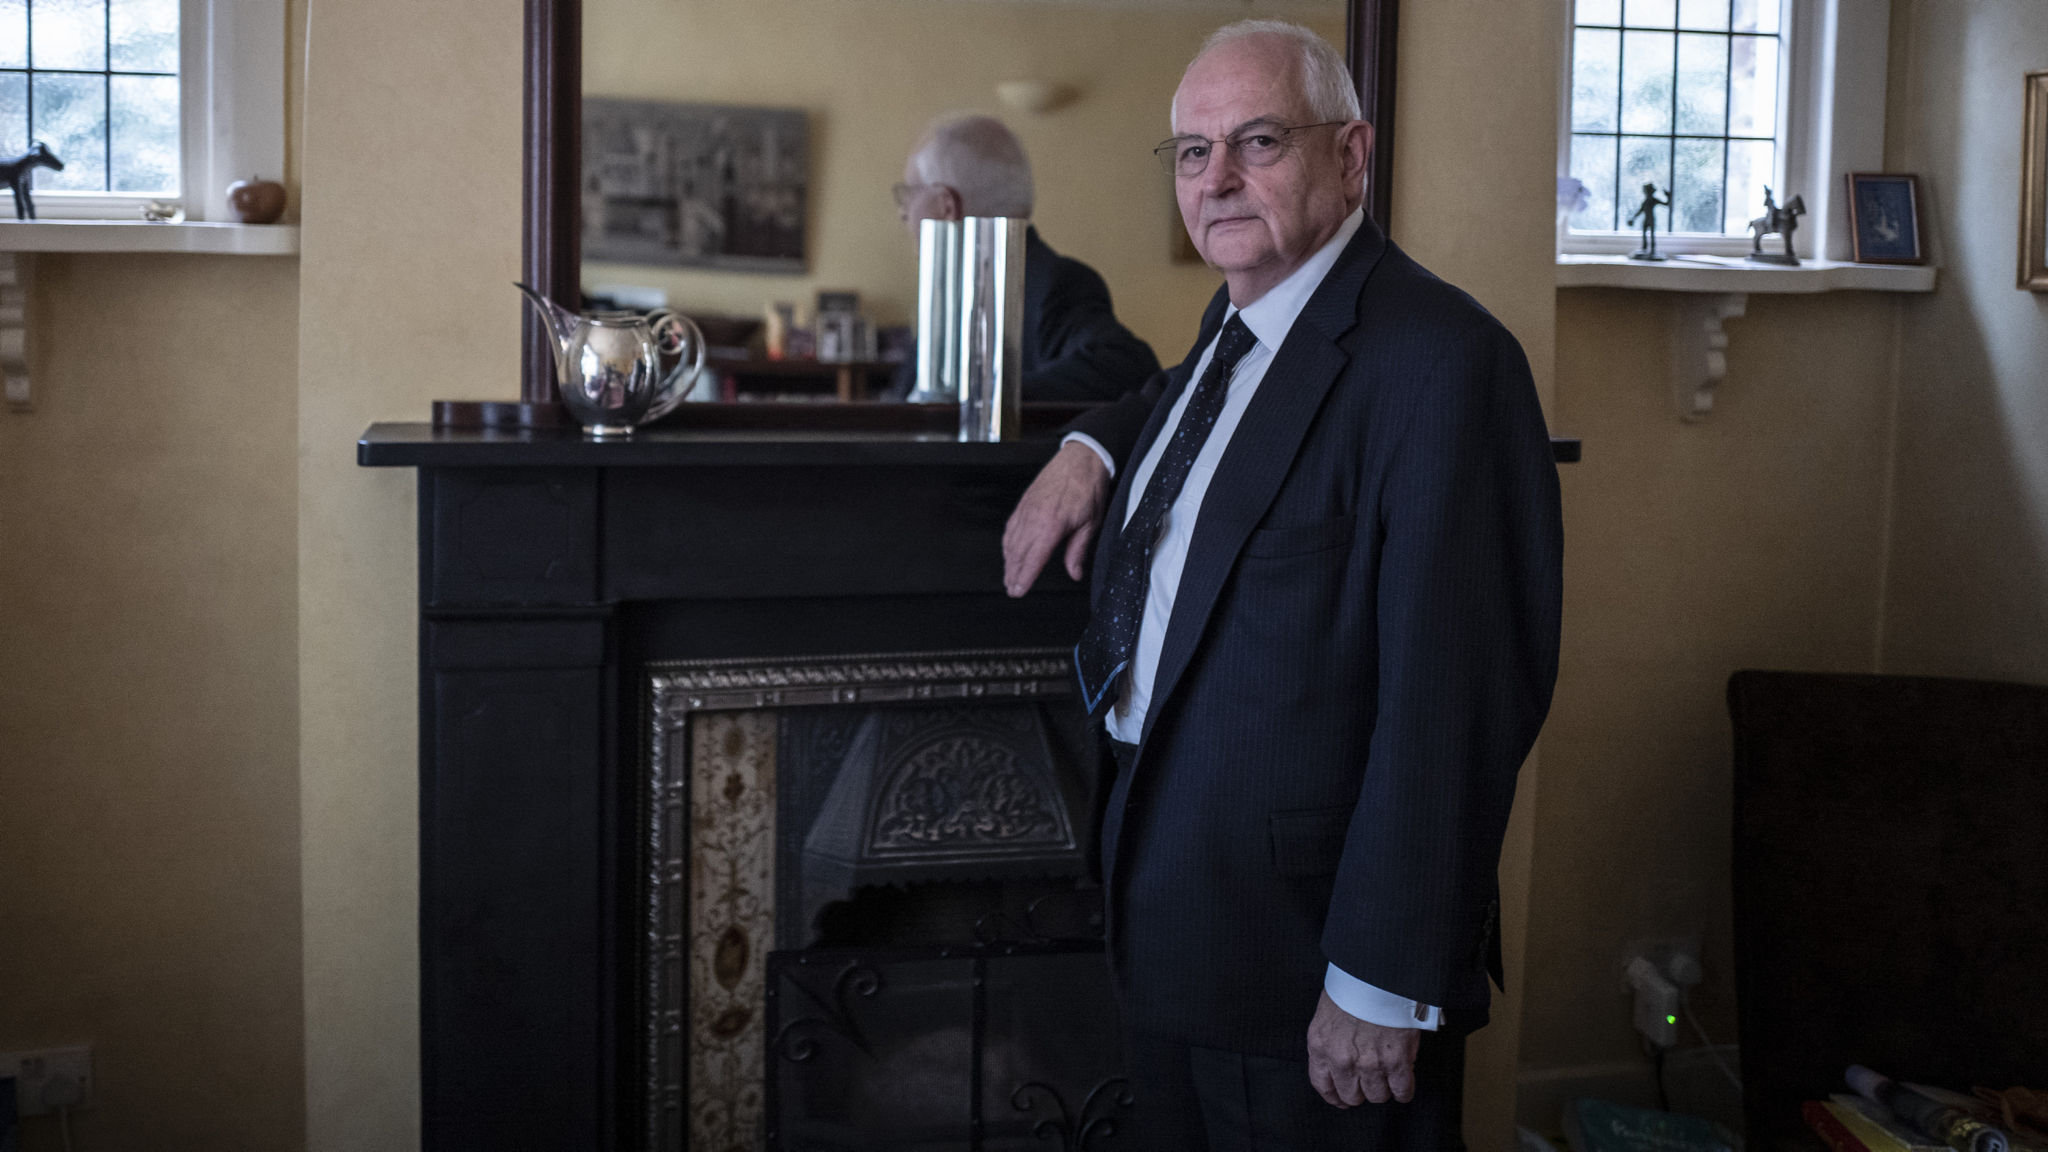 Martin Wolf accepts the Gerald Loeb Lifetime Achievement Award